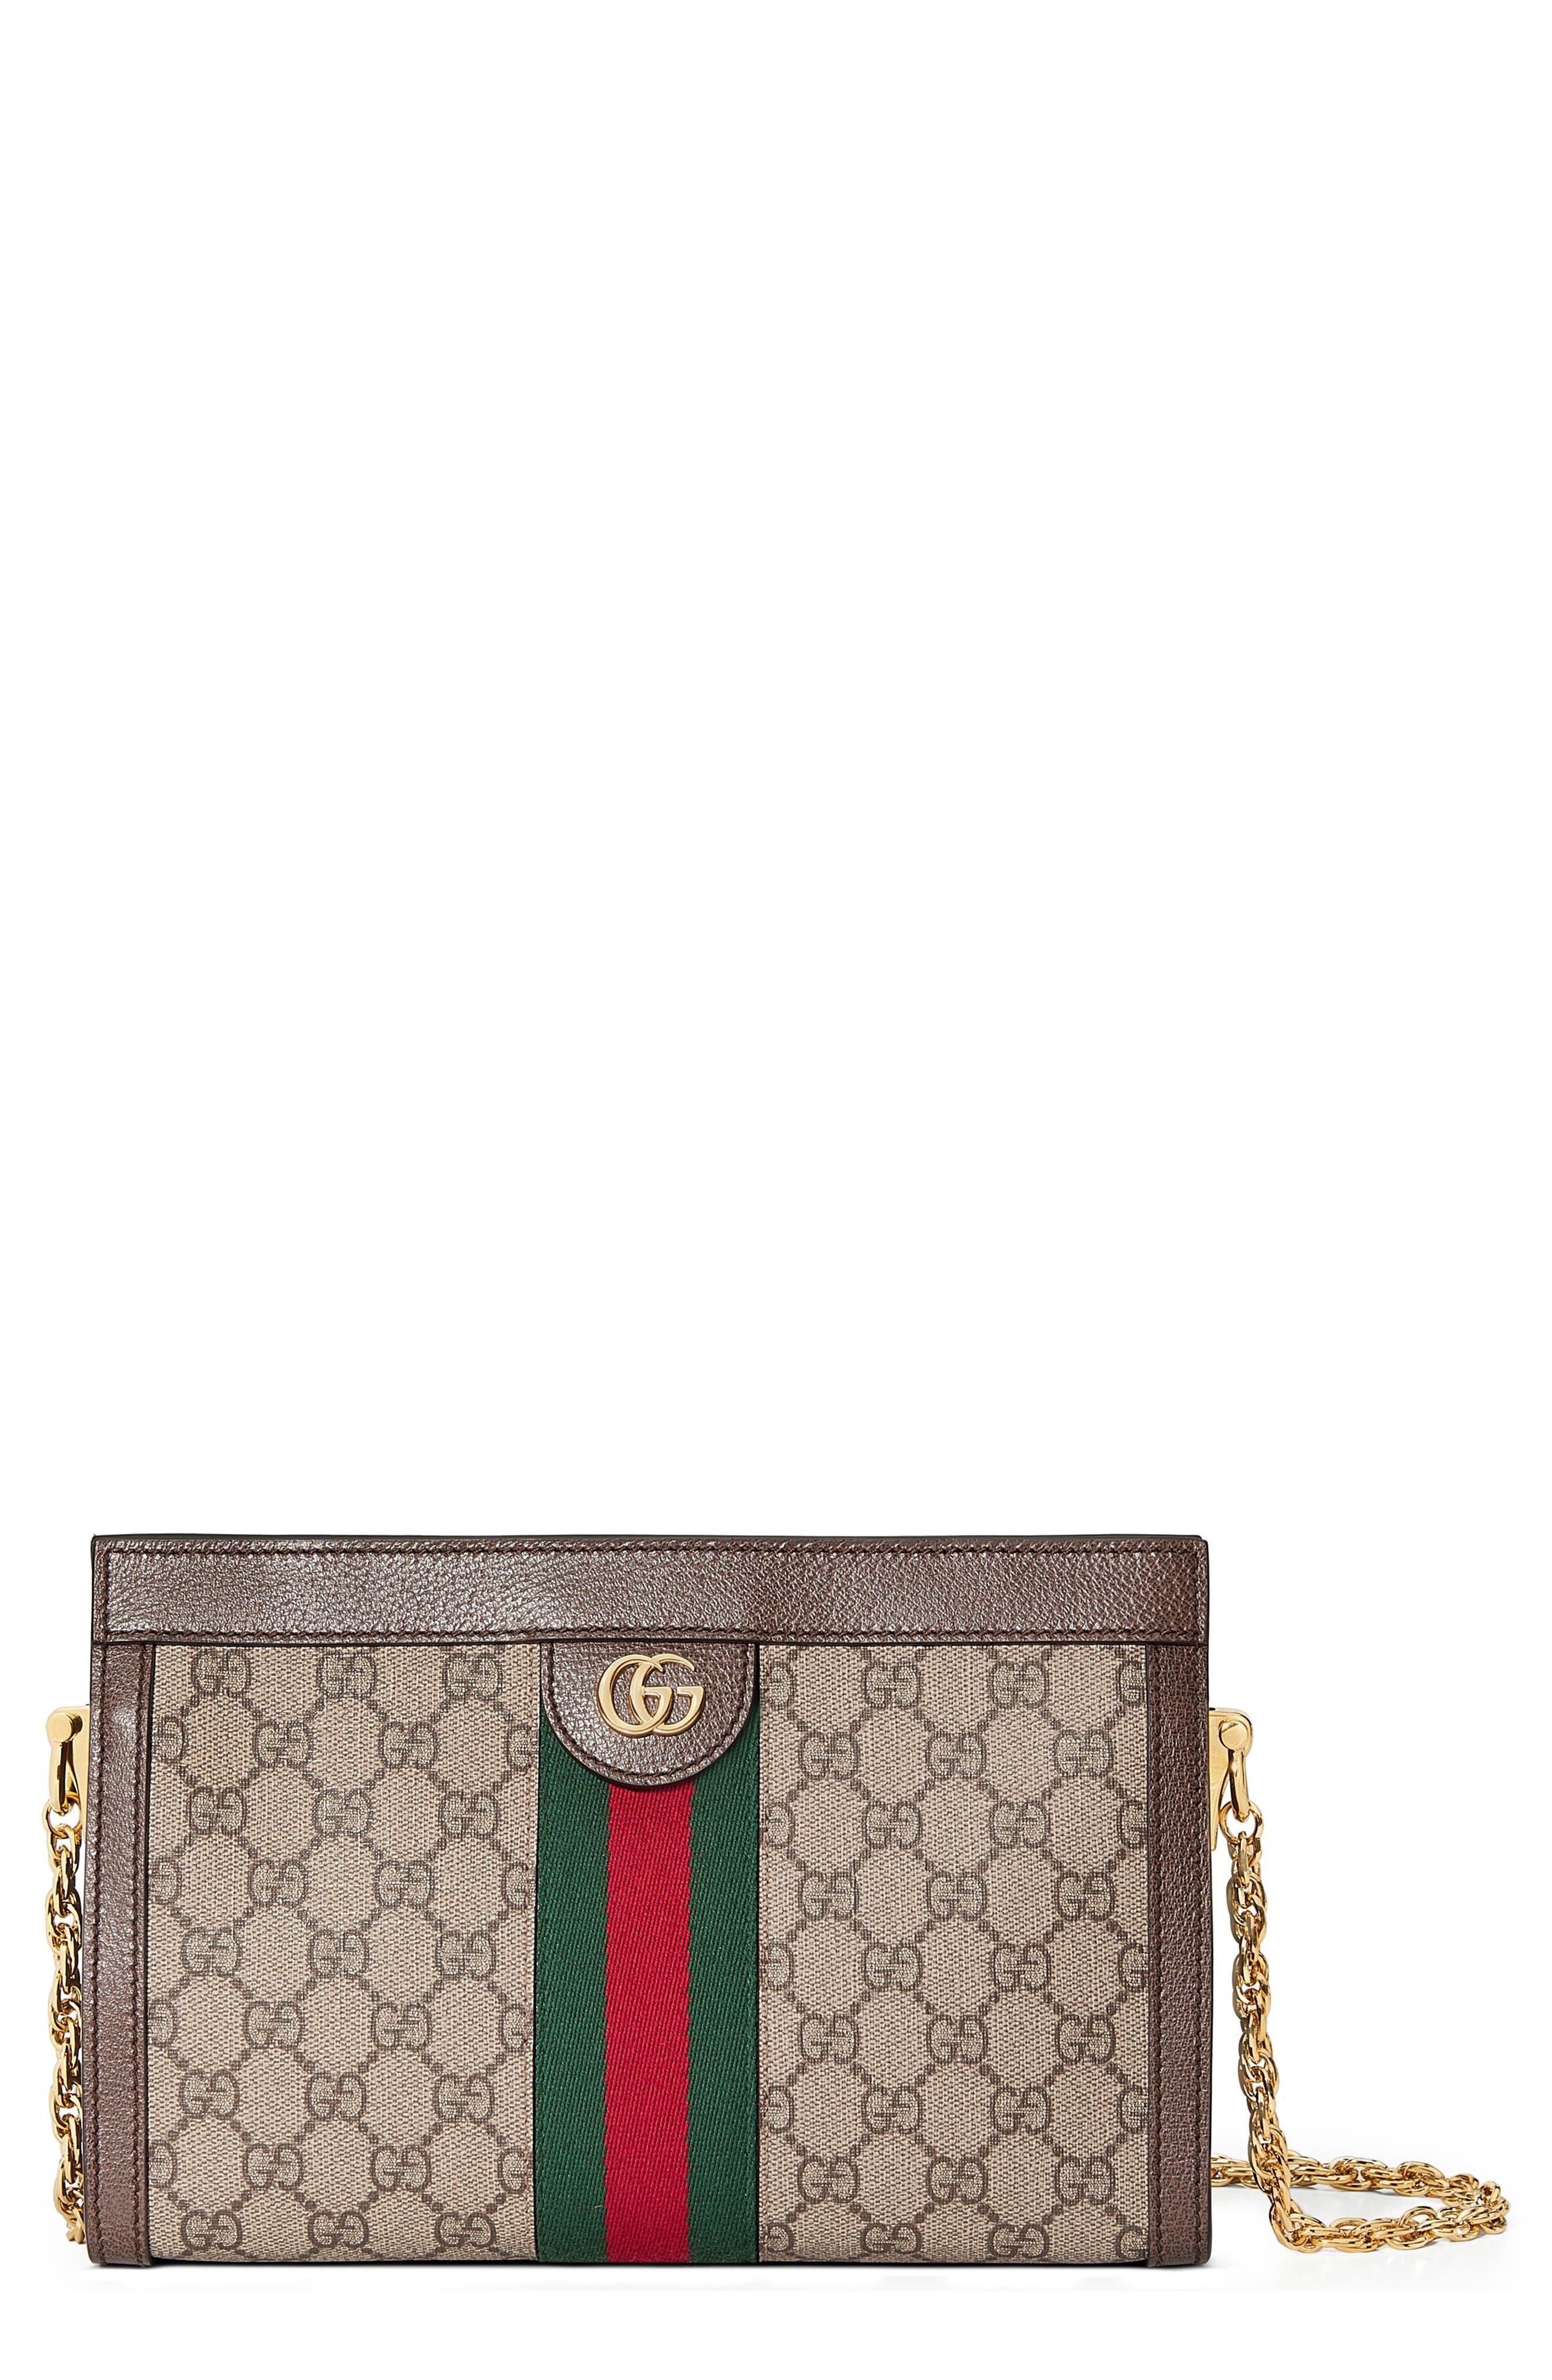 Small GG Supreme Shoulder Bag, Main, color, BEIGE EBONY/ NERO/ VERT/ RED